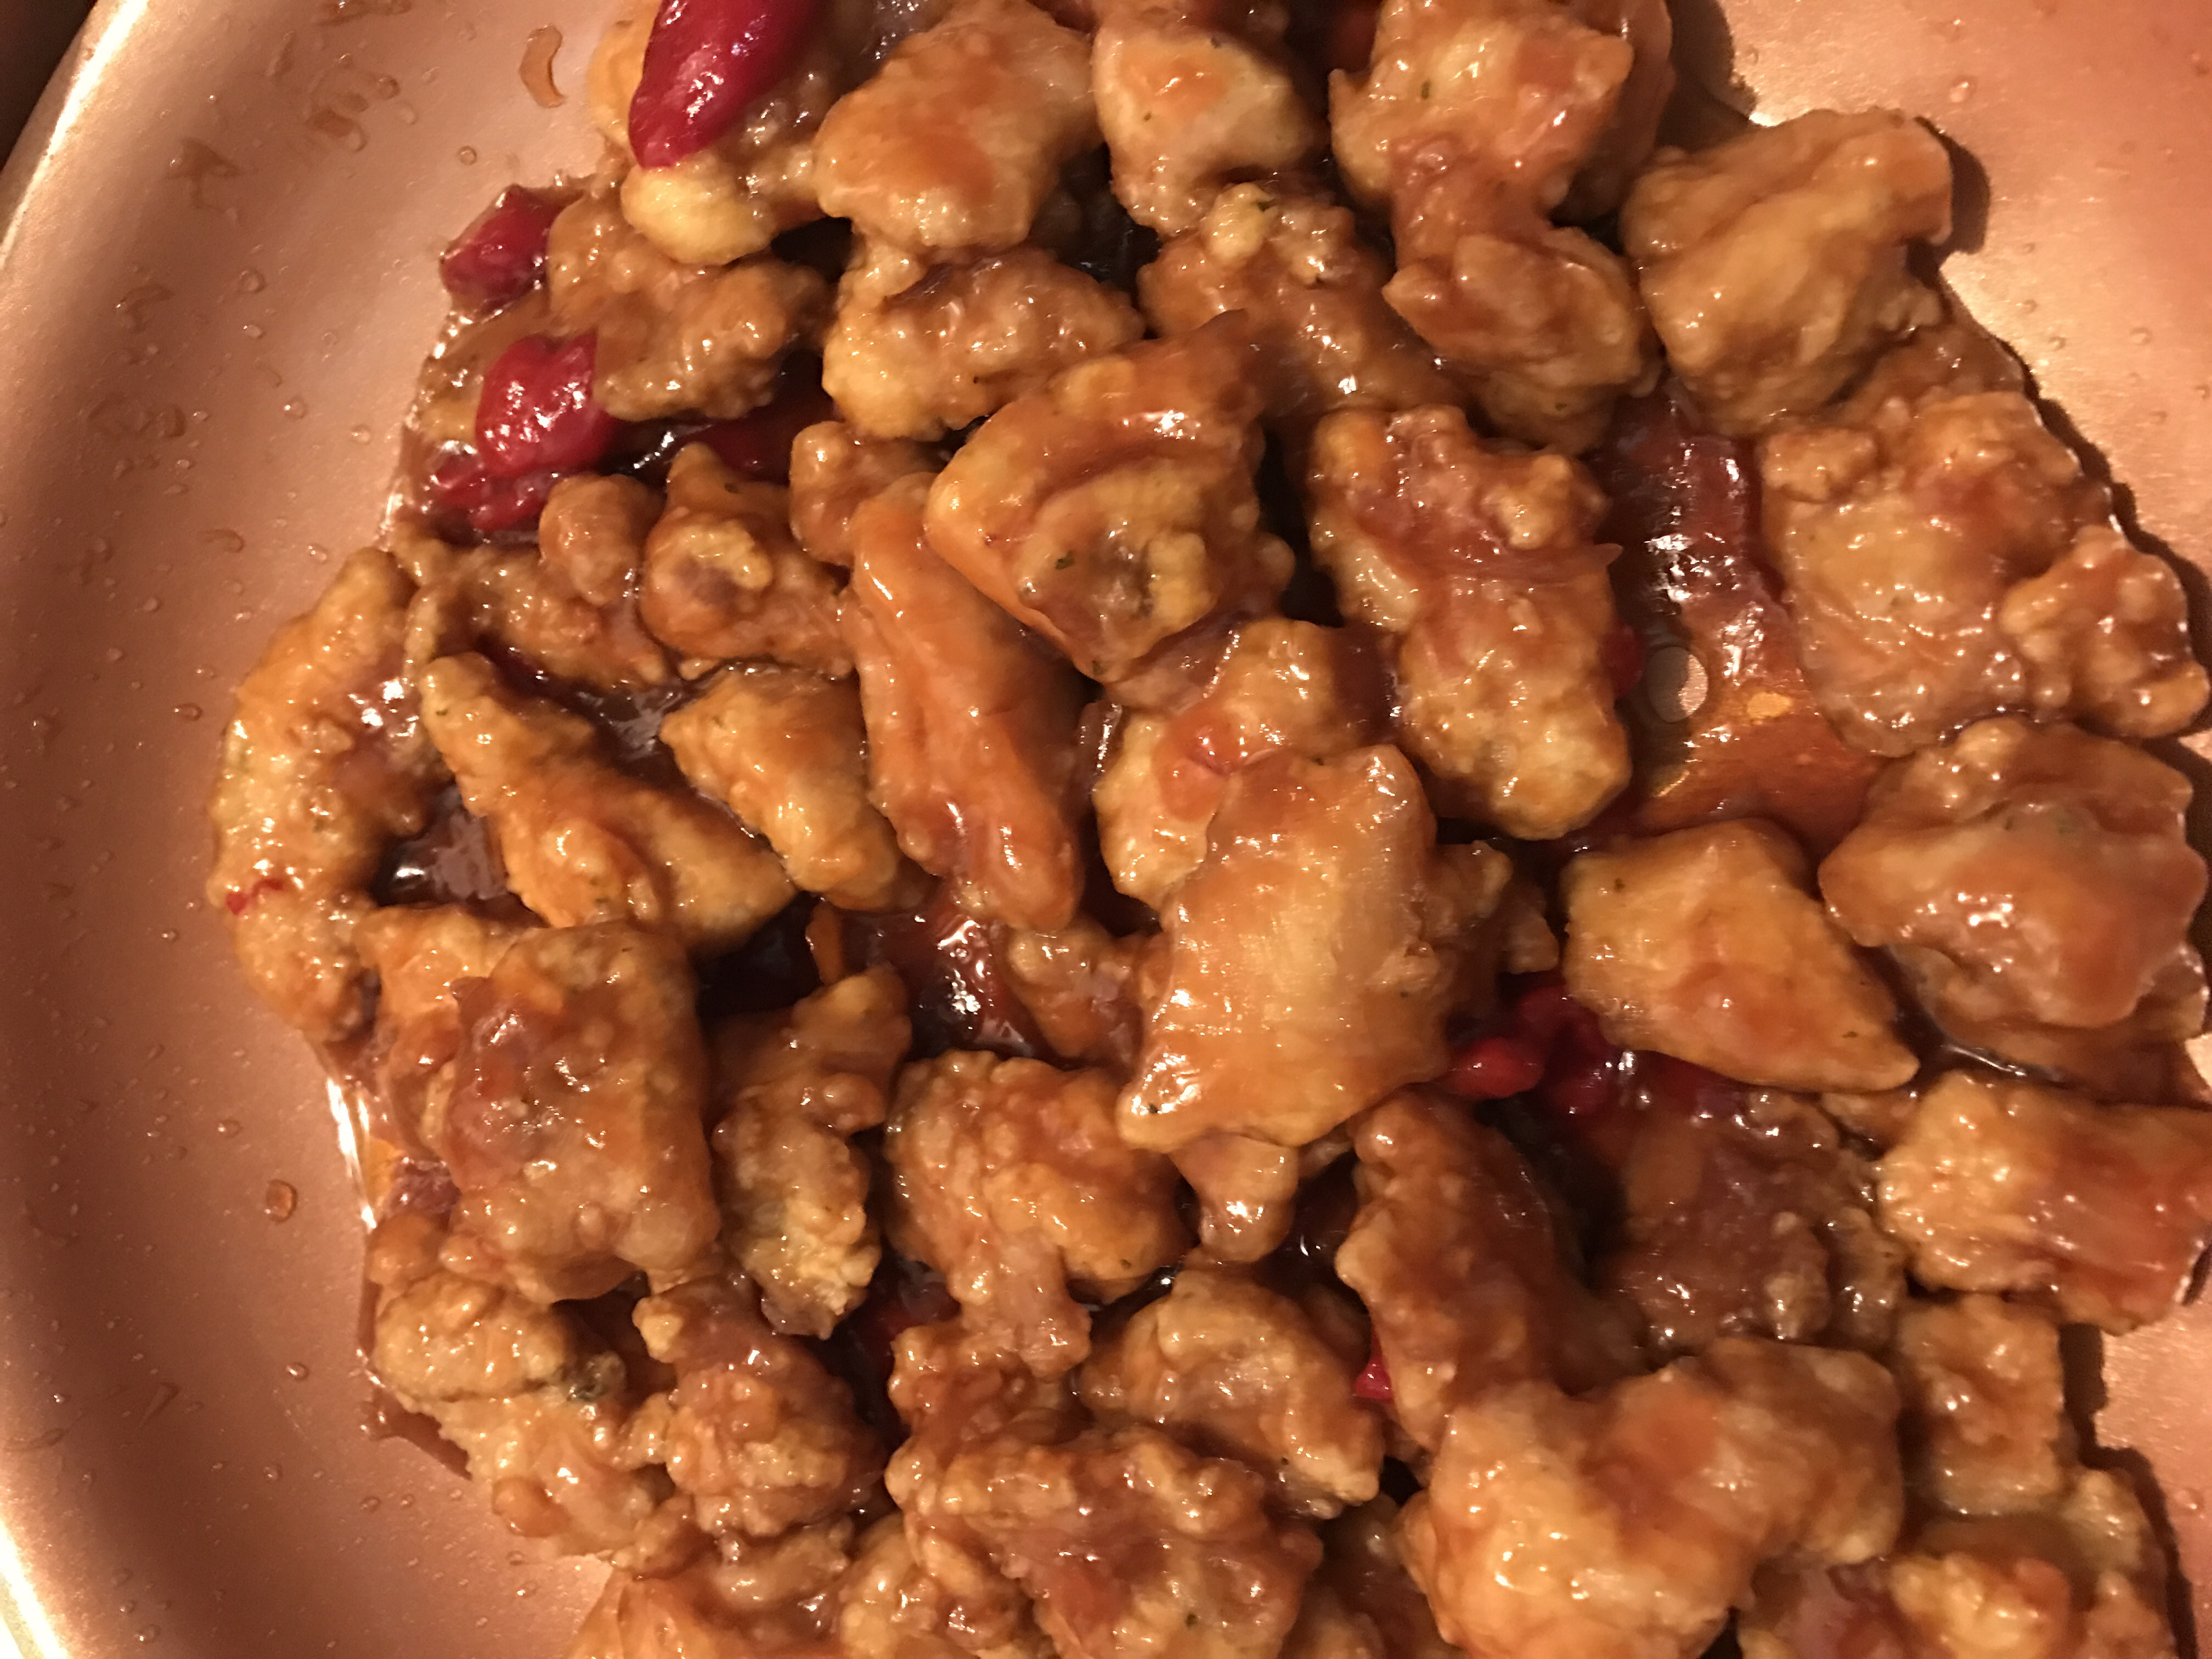 General Tsao's Chicken II Annette Velez